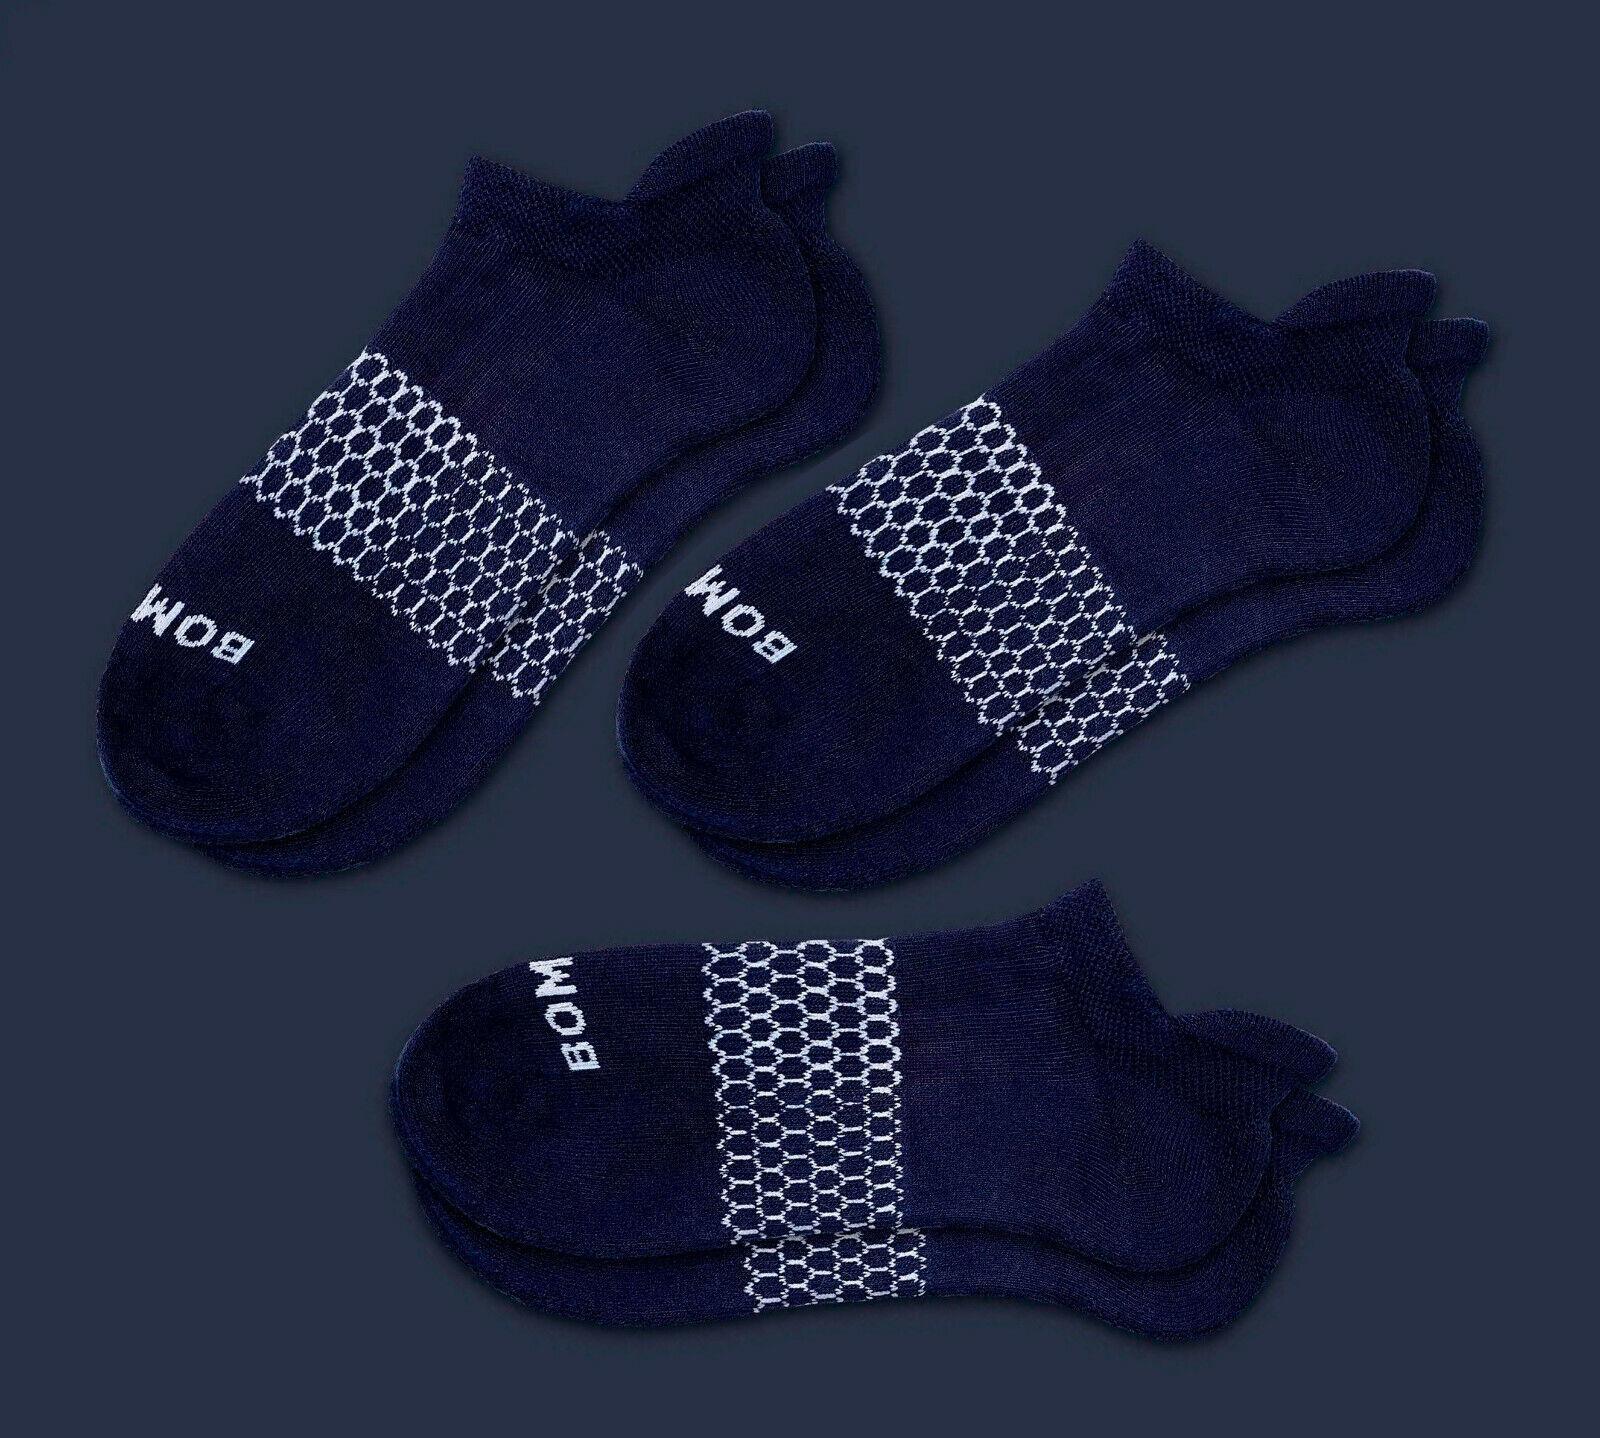 3-Pack Bombas Men's Ankle Socks Navy Blue Honeycomb Large 8-